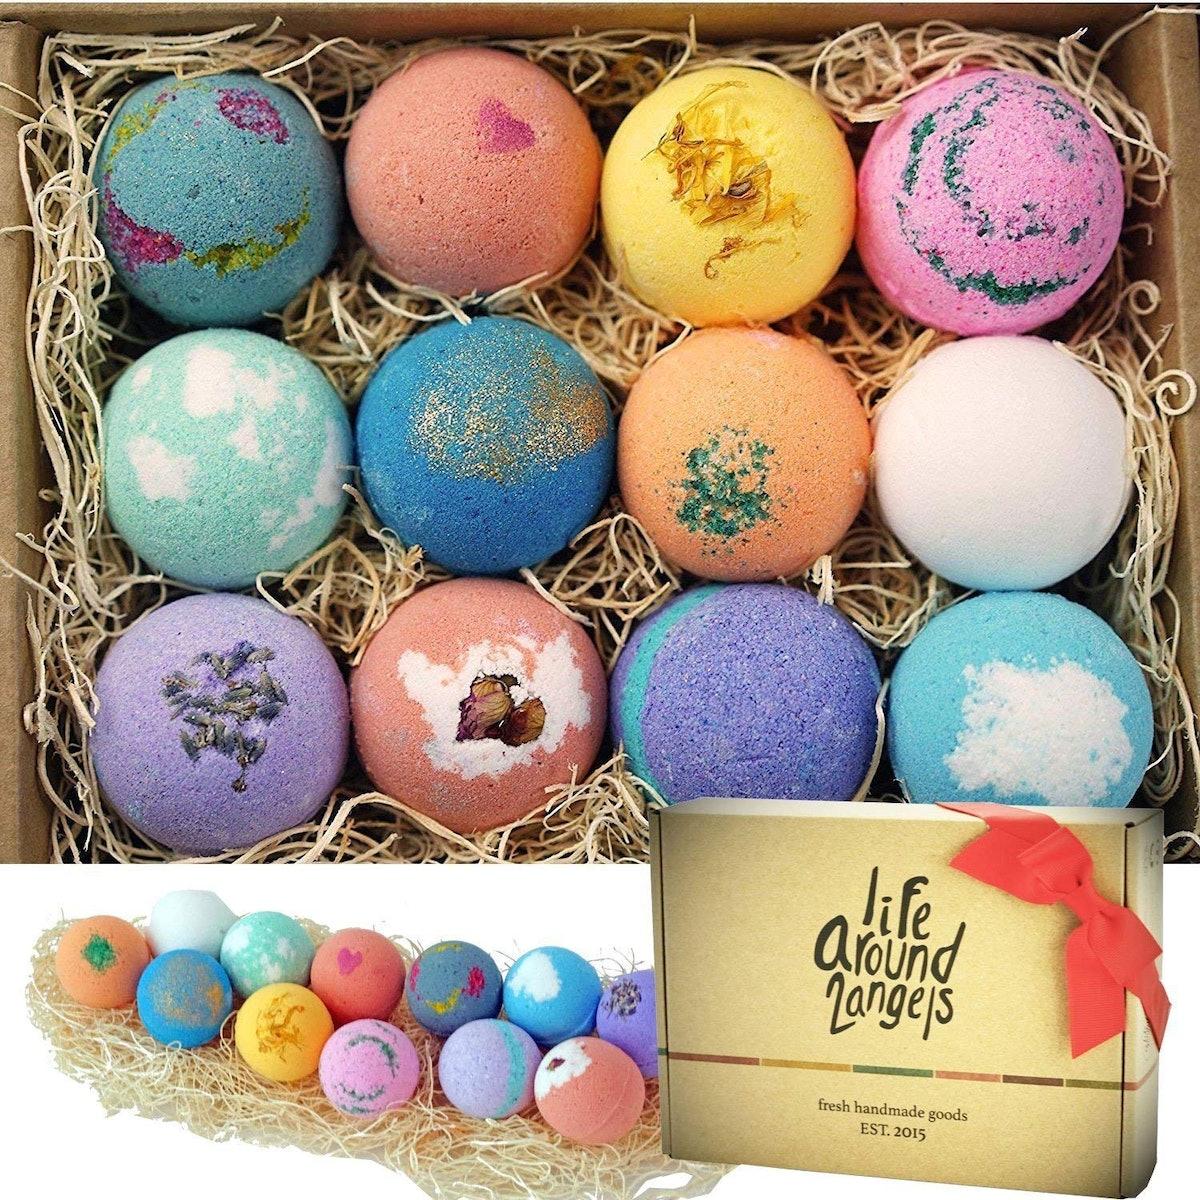 LifeAround2Angels Bath Bombs Gift Set (Set of 12)